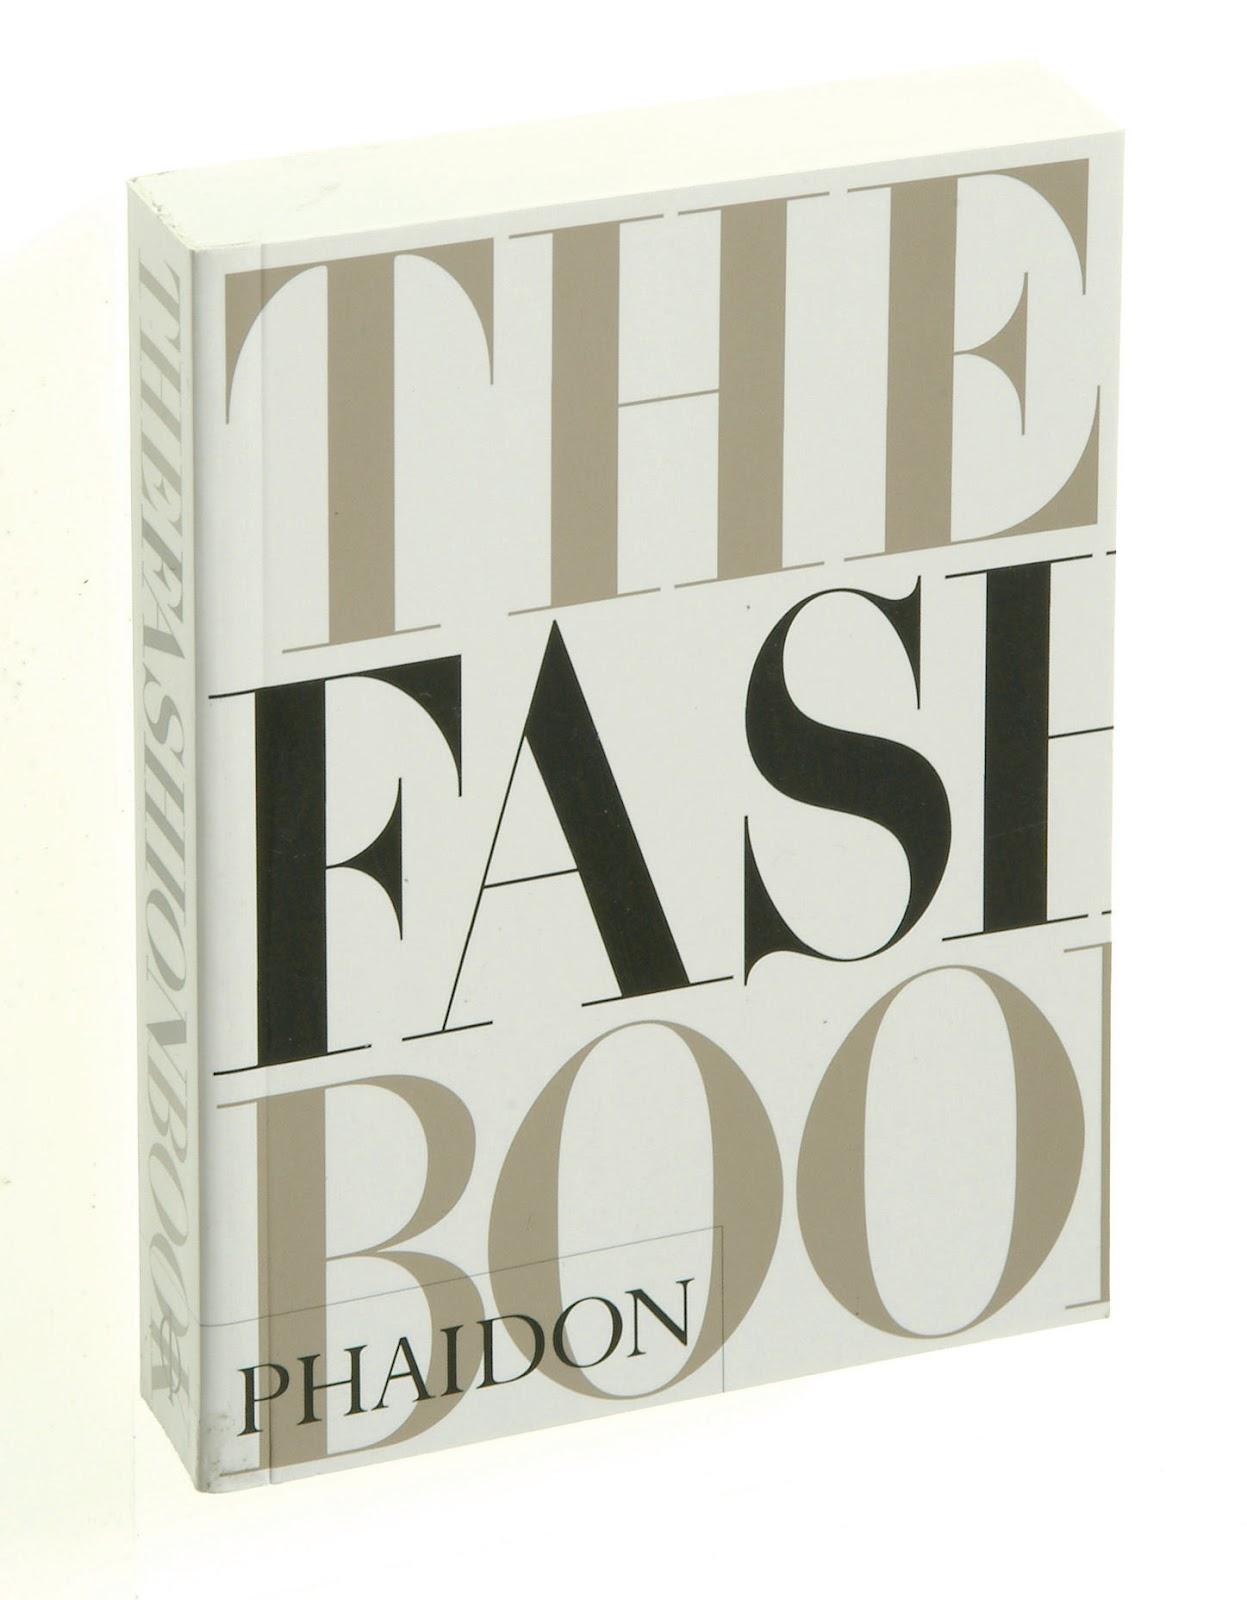 Fashion Books 2017: La Maison Sartorie D'Amber: My Latest Purchases